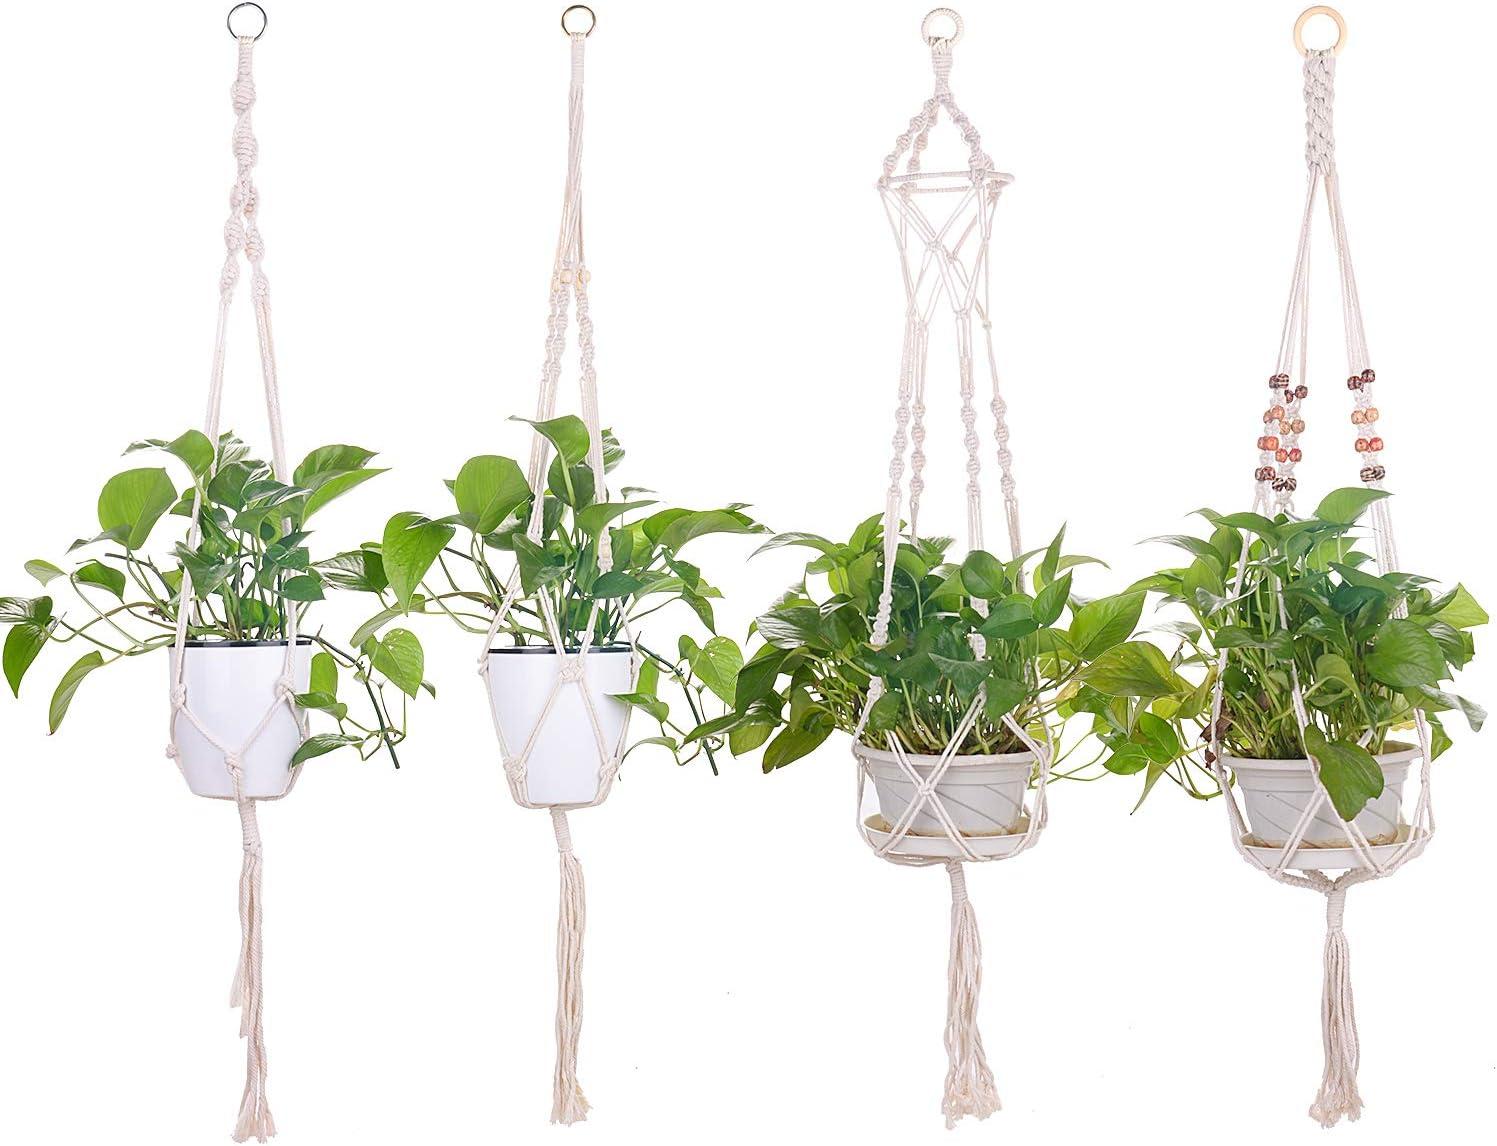 Mixhome New popularity Rope Luxury goods Hanging Planter Set of Macrame Hanger 4pcs C Plant